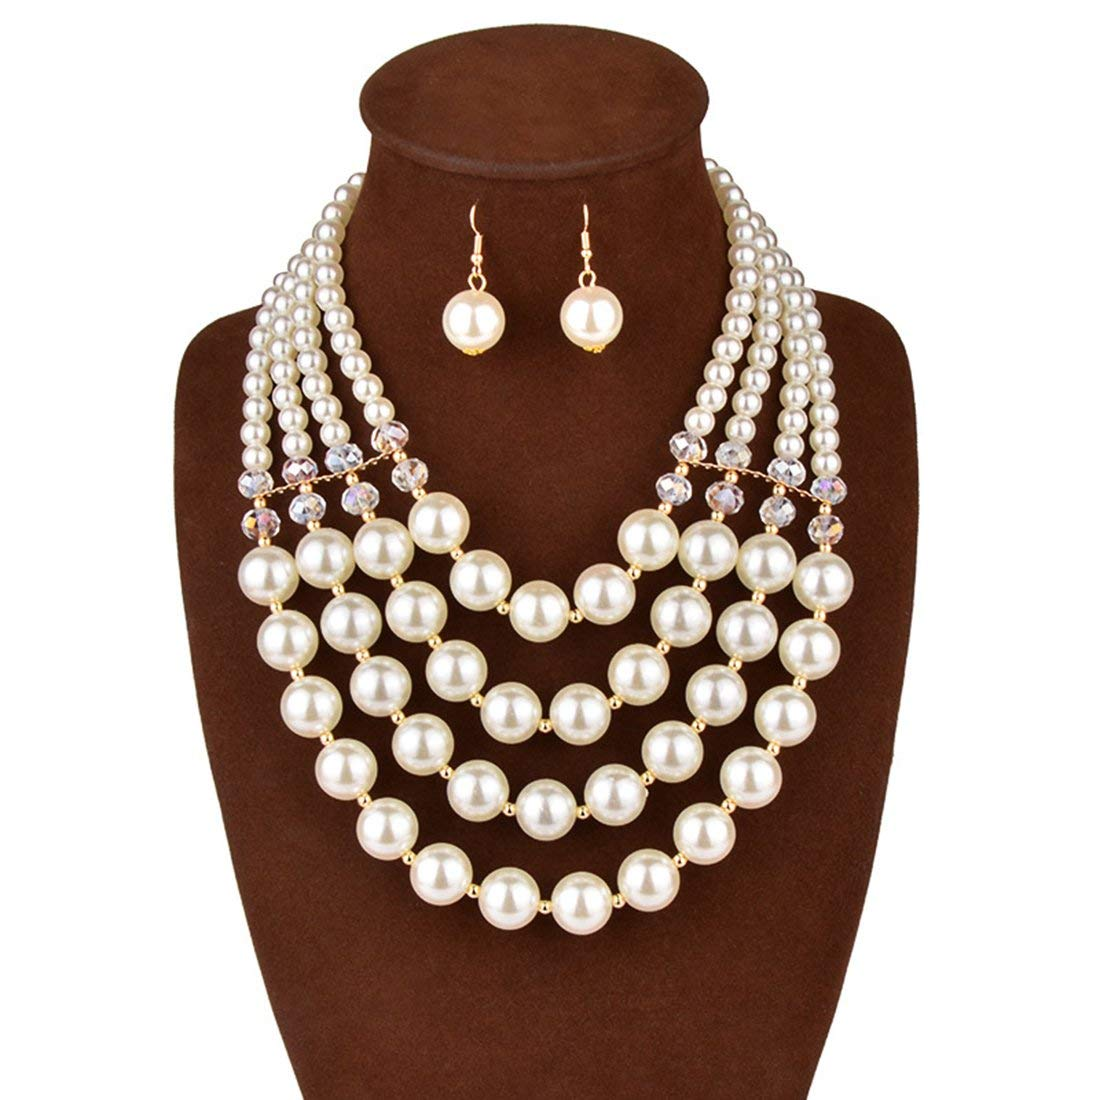 3314e35d7314c Cheap Flapper Pearls, find Flapper Pearls deals on line at Alibaba.com